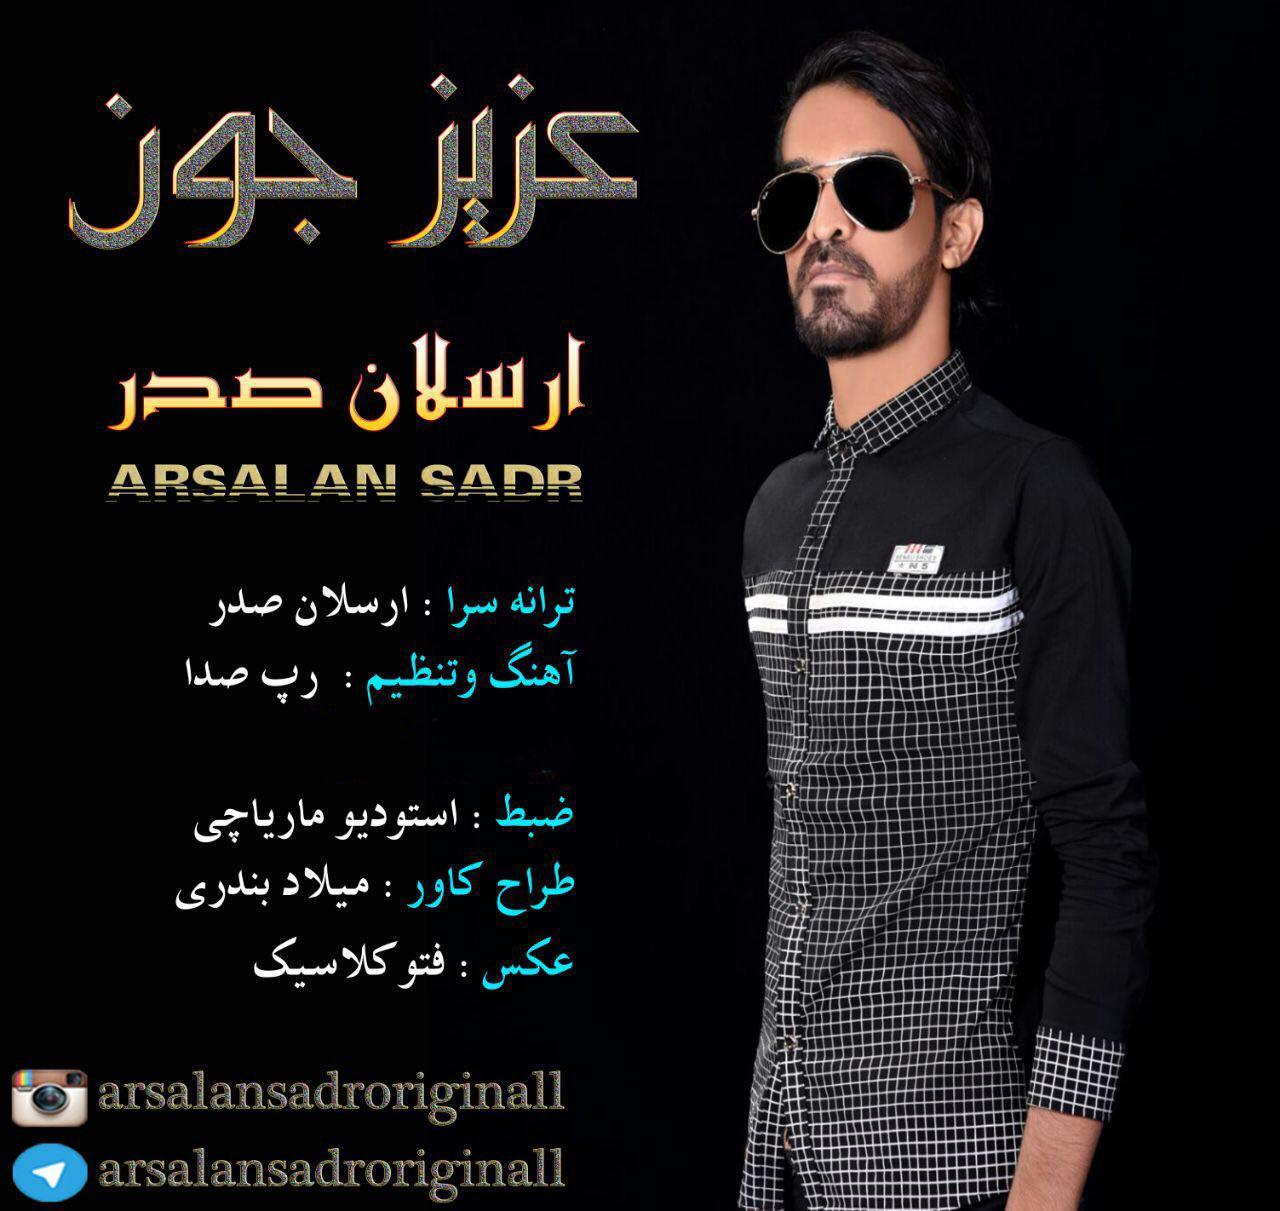 Arsalan Sadr – Aziz Jon